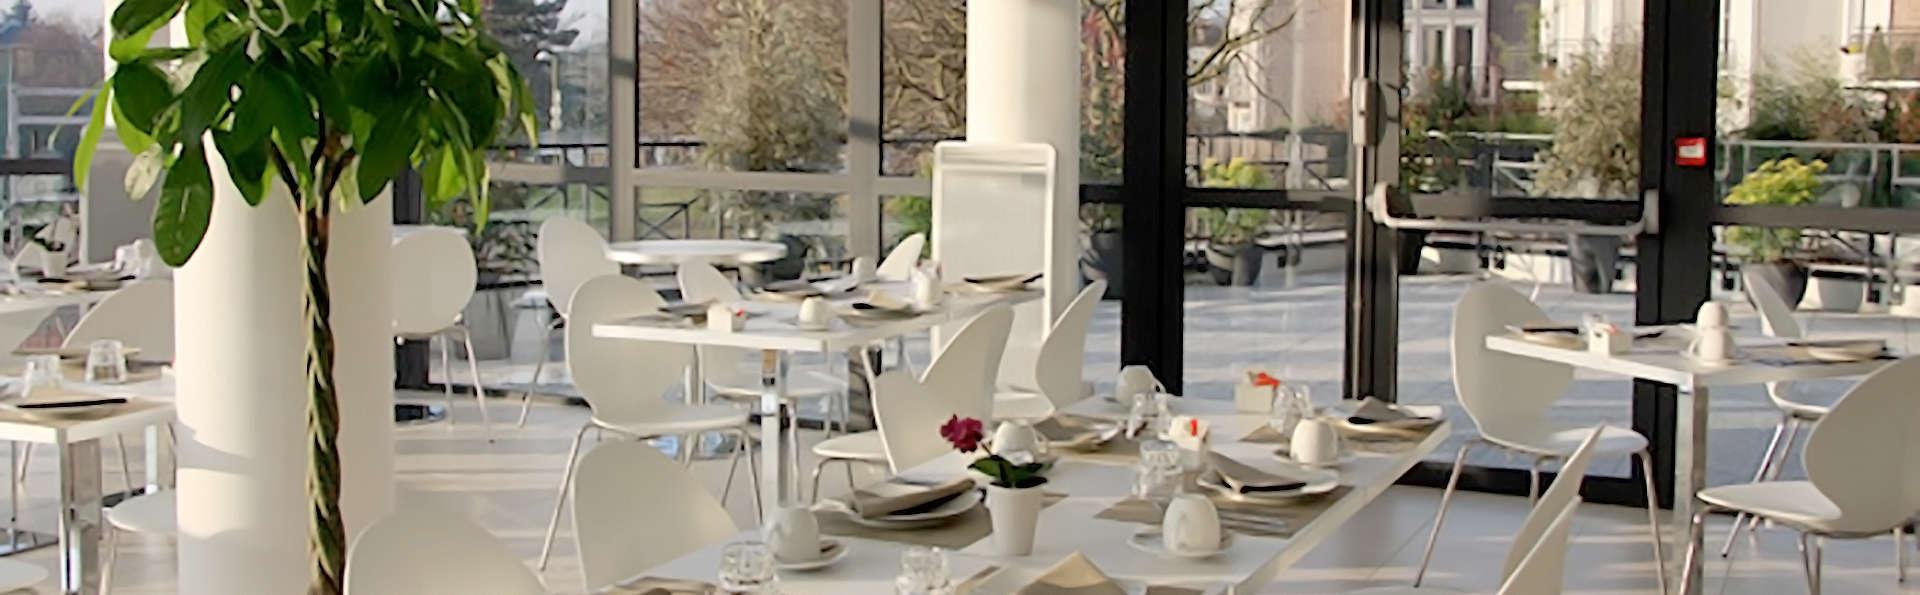 Residhome Neuilly Bords de Marne  - Edit_Restaurant3.jpg